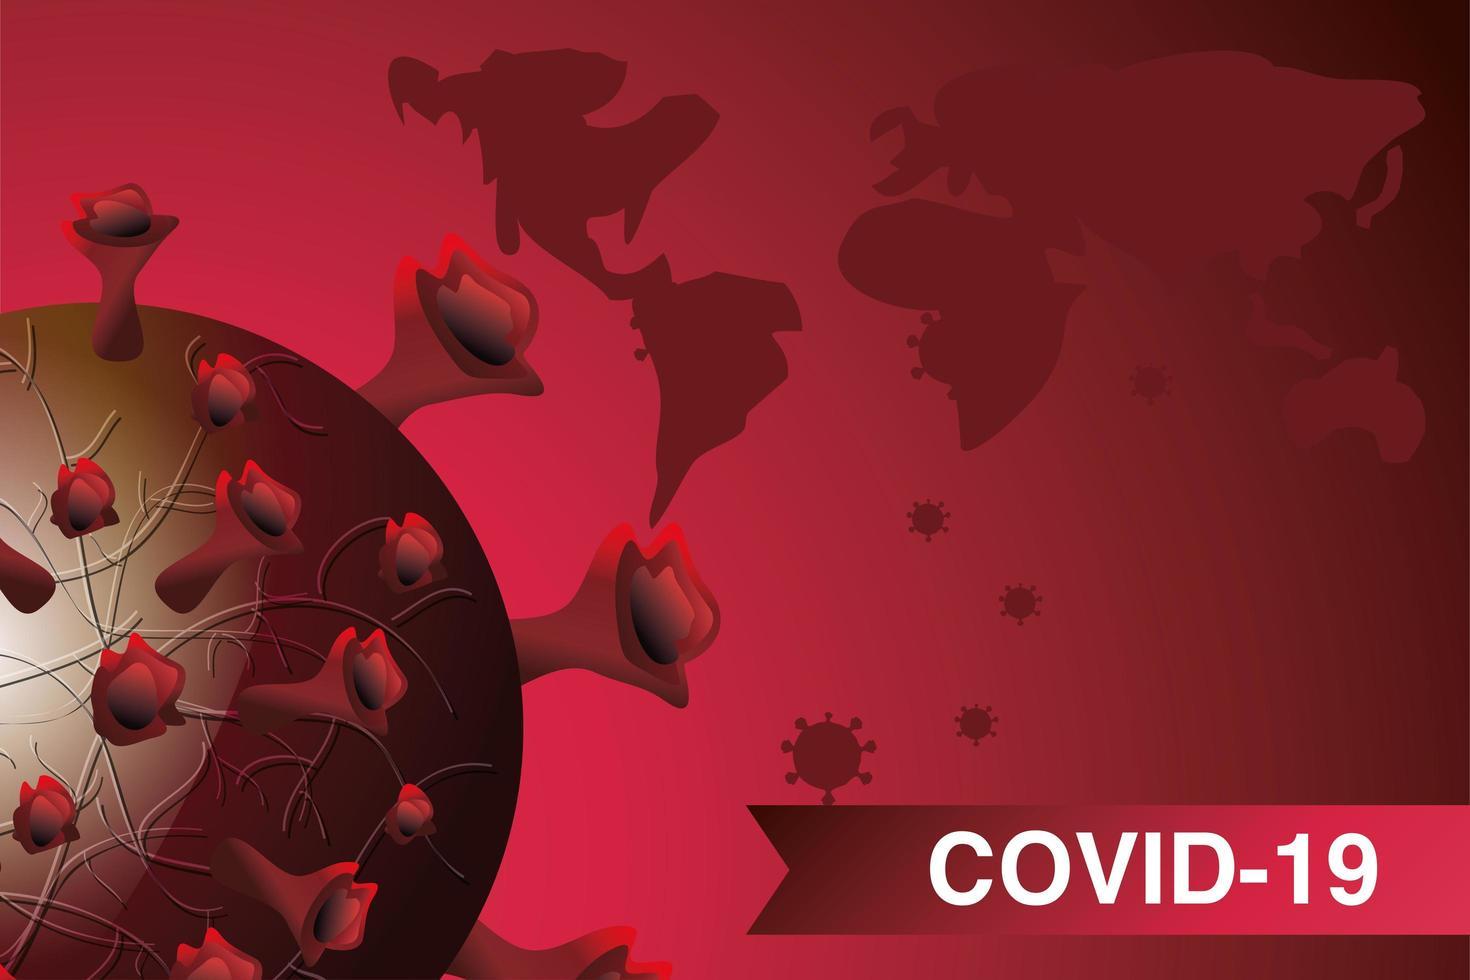 coronavirus sjukdom eller covid 19, flytande virusceller vektor